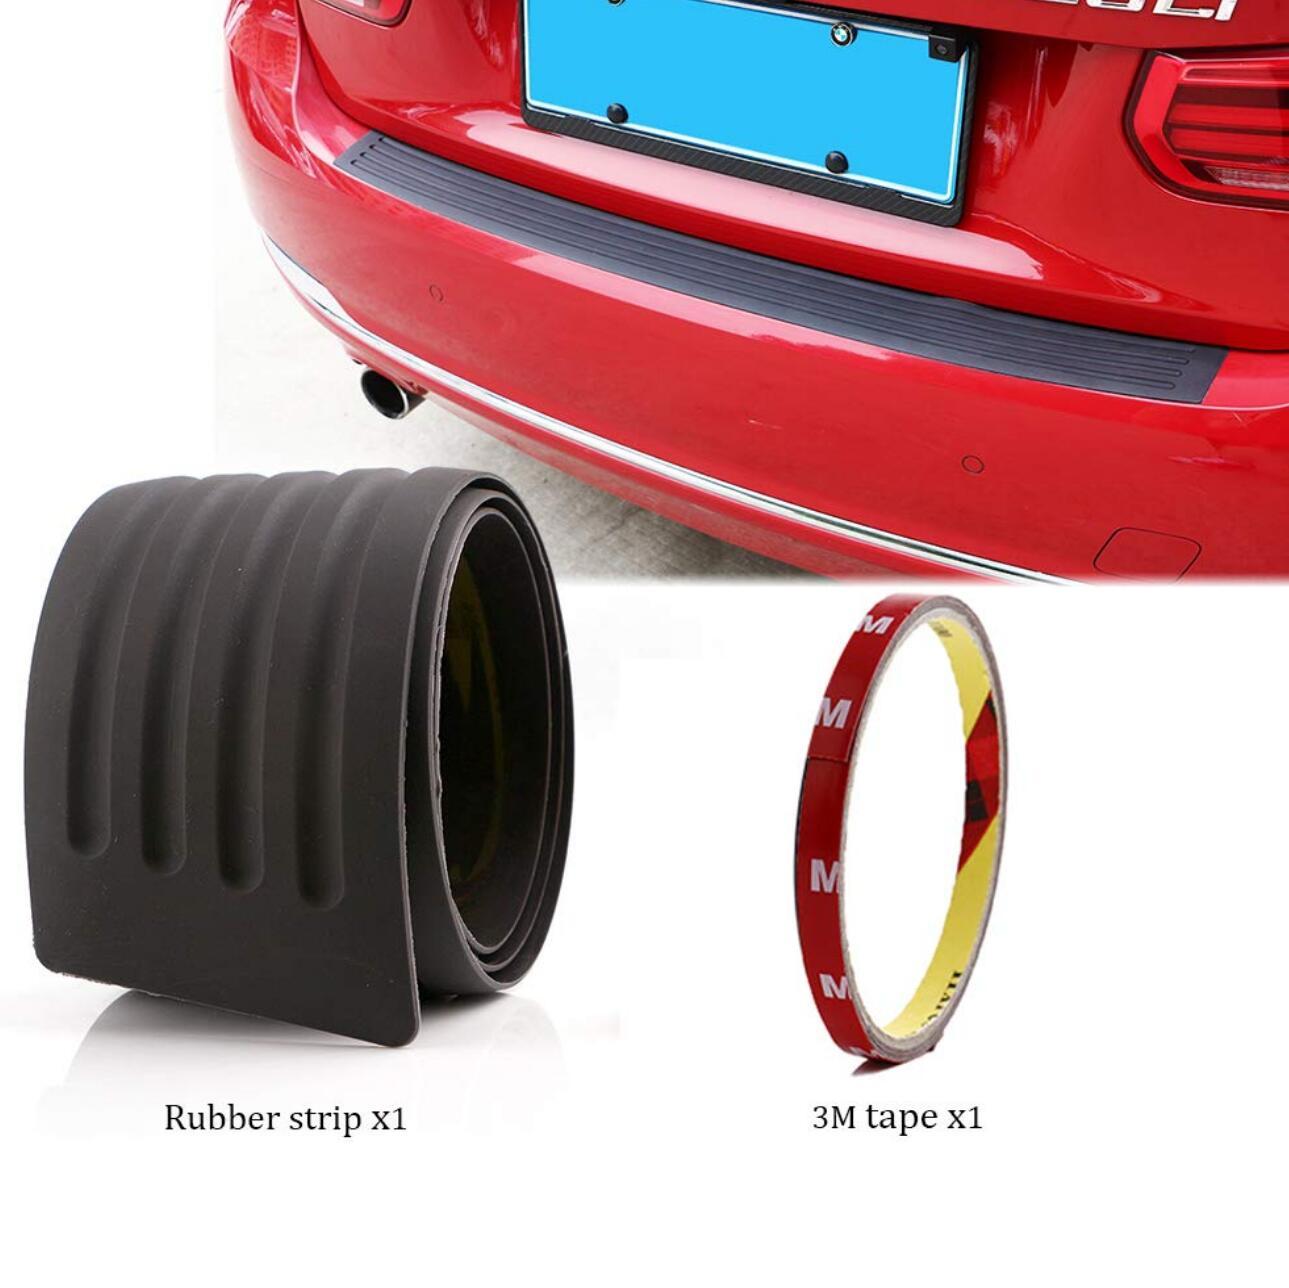 Car Styling Rear Bumper Scuff Cover Sticker For Kia Magentis Optima 3 4  Sorento Sportage Toyota Prius RAV 4 Yaris Accessories-in Car Stickers from Automobiles & Motorcycles